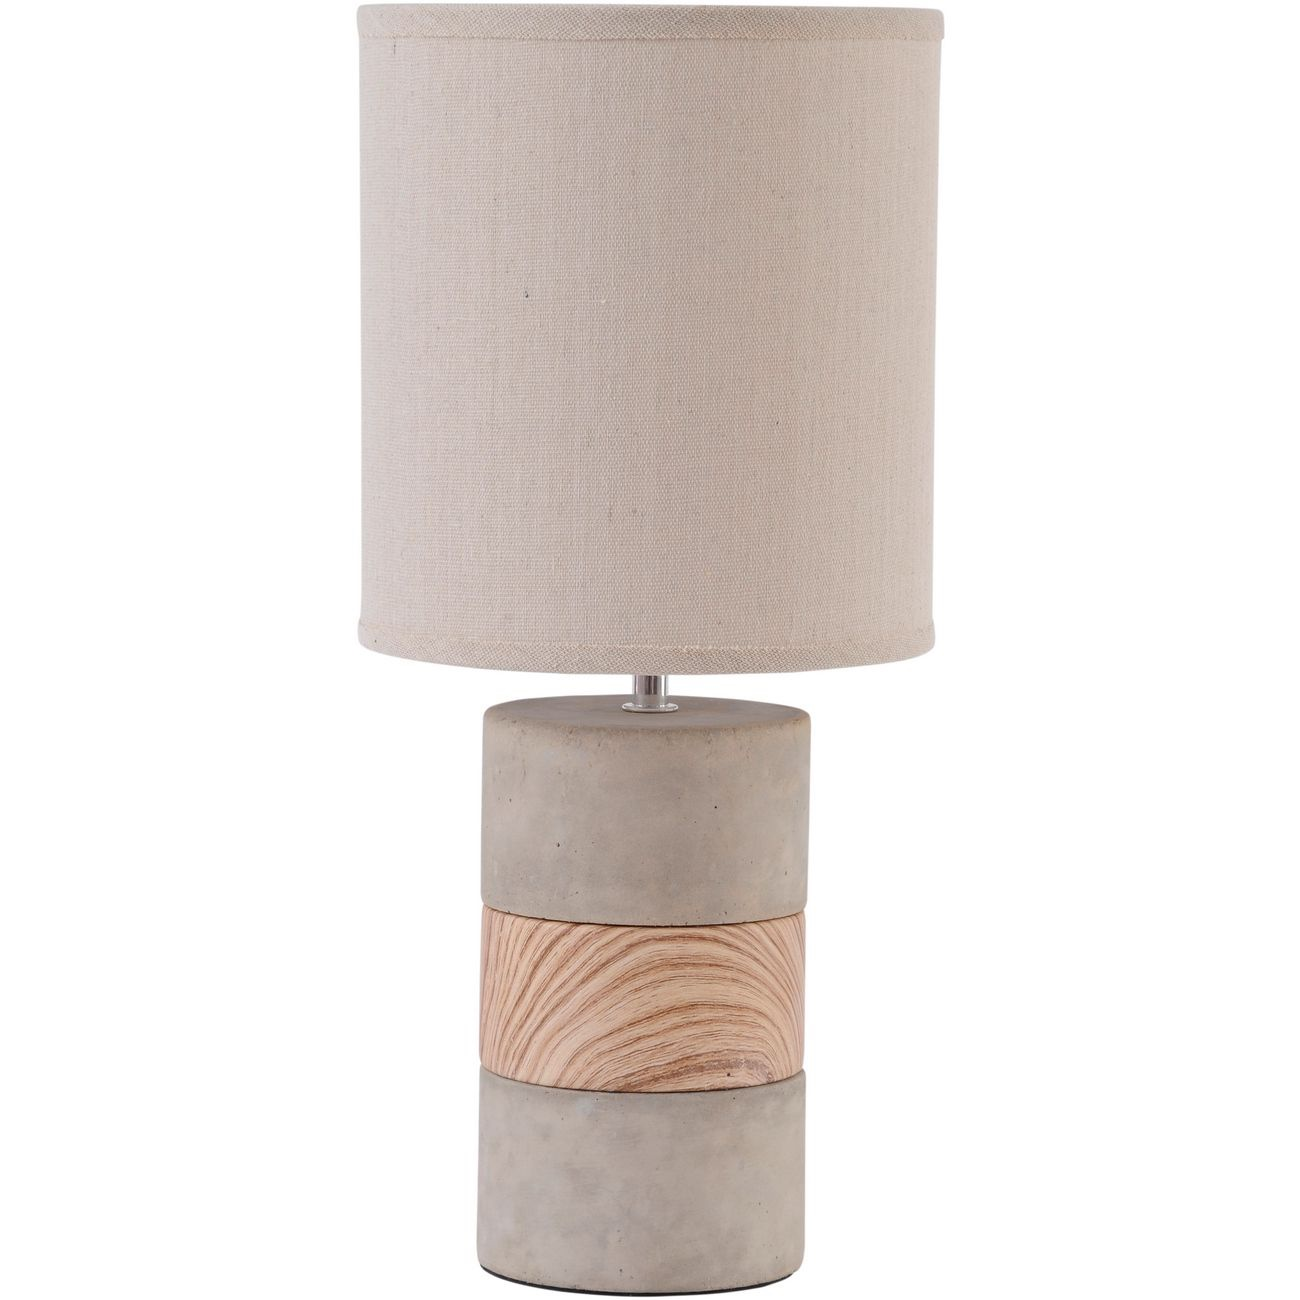 Concrete Table Lamp | Lighting